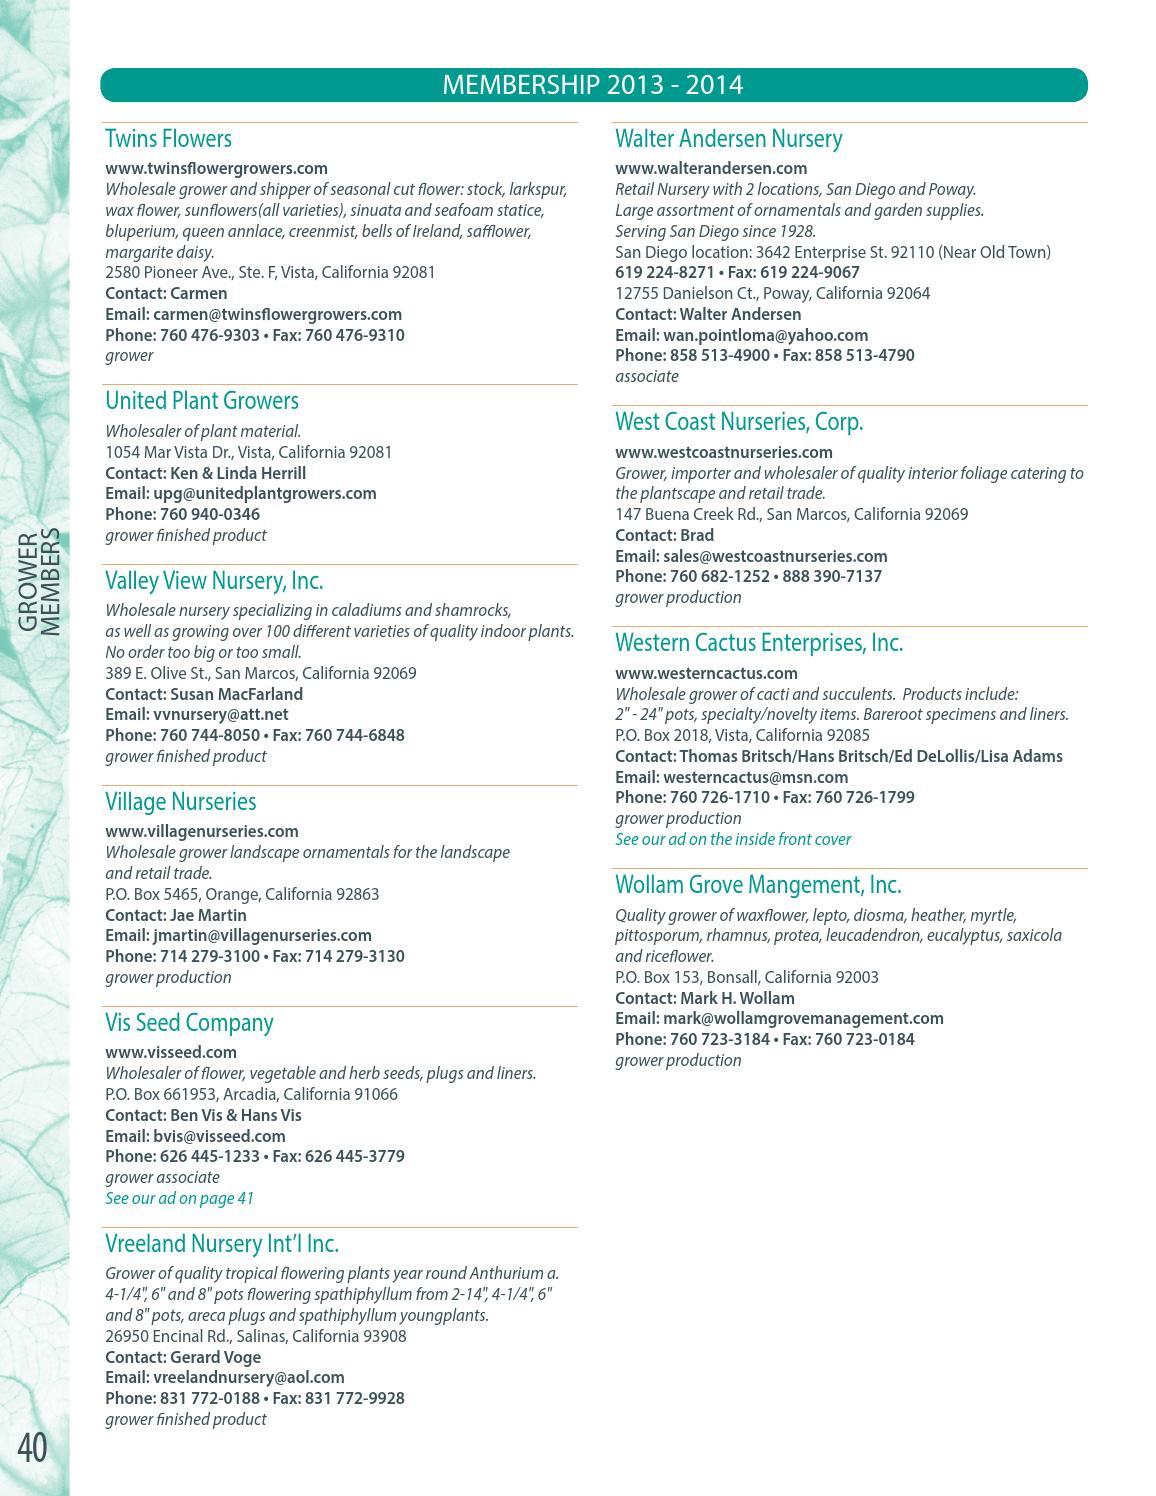 San Diego County Flower & Plant Membership Directory